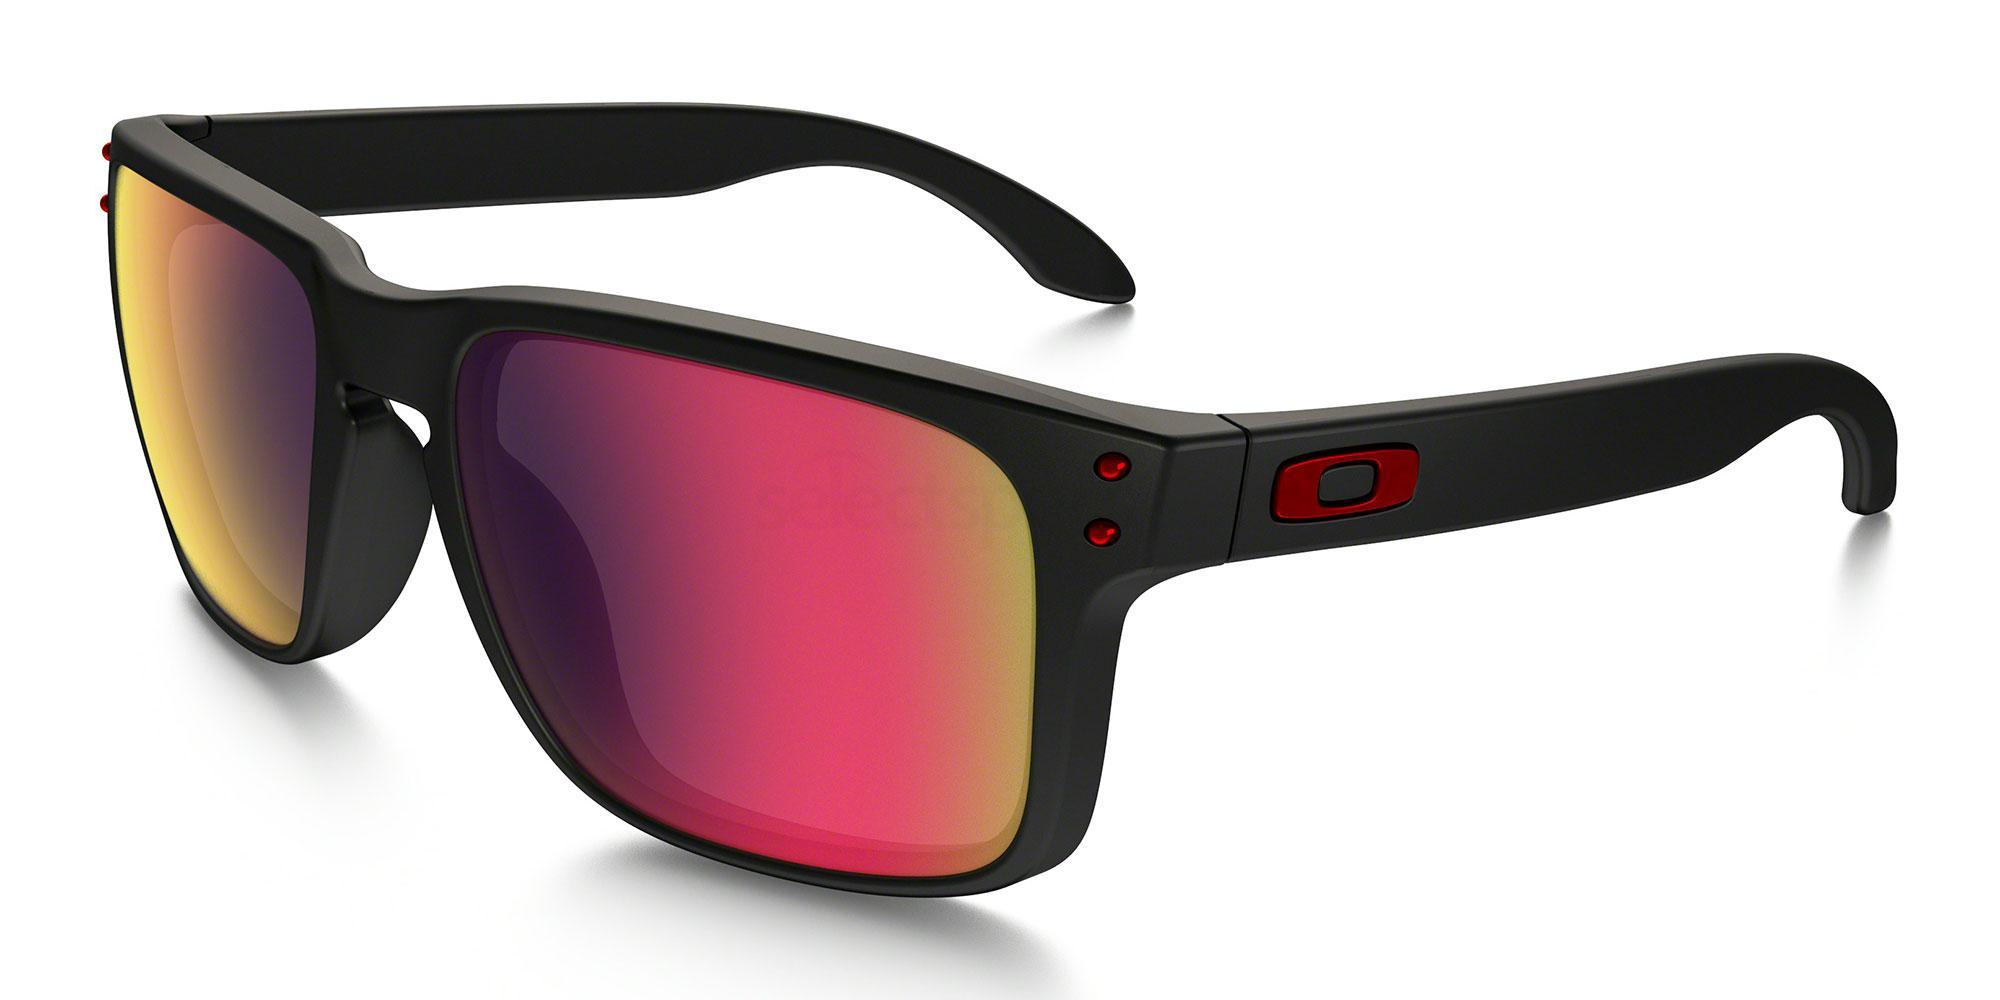 910236 OO9102 HOLBROOK (Standard) (3/3) Sunglasses, Oakley